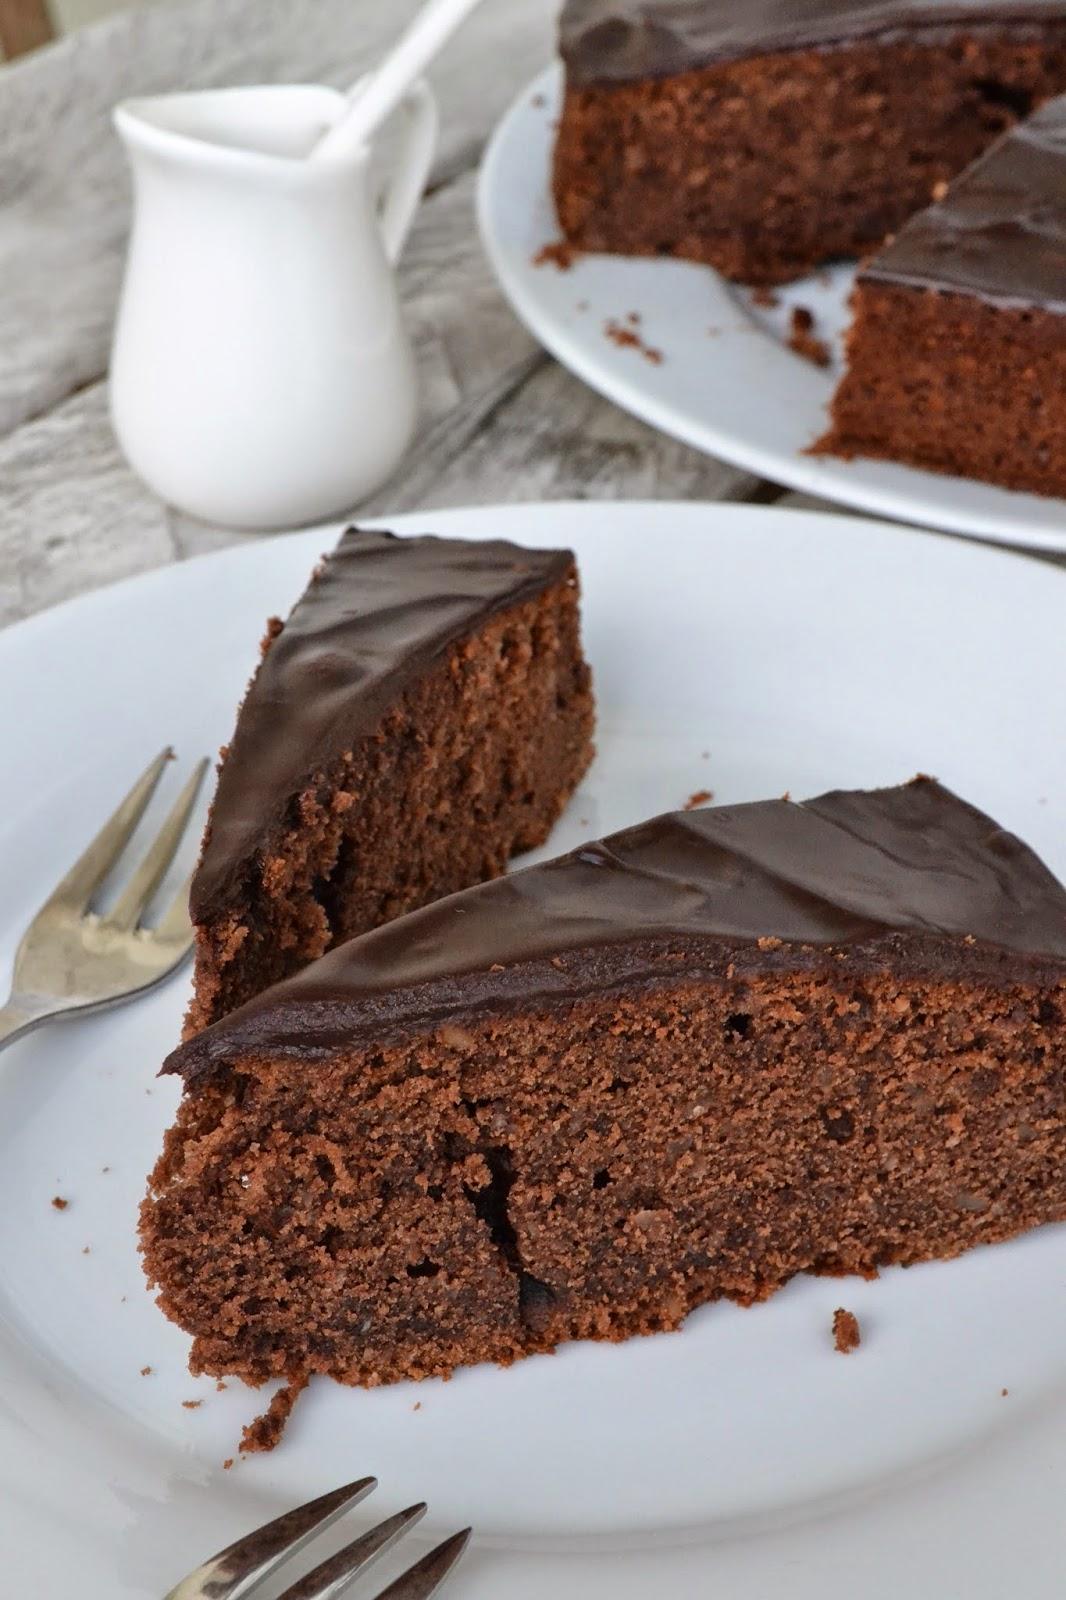 Mandel Schokoladenkuchen Mit Schokoladenglasur Schokolade The